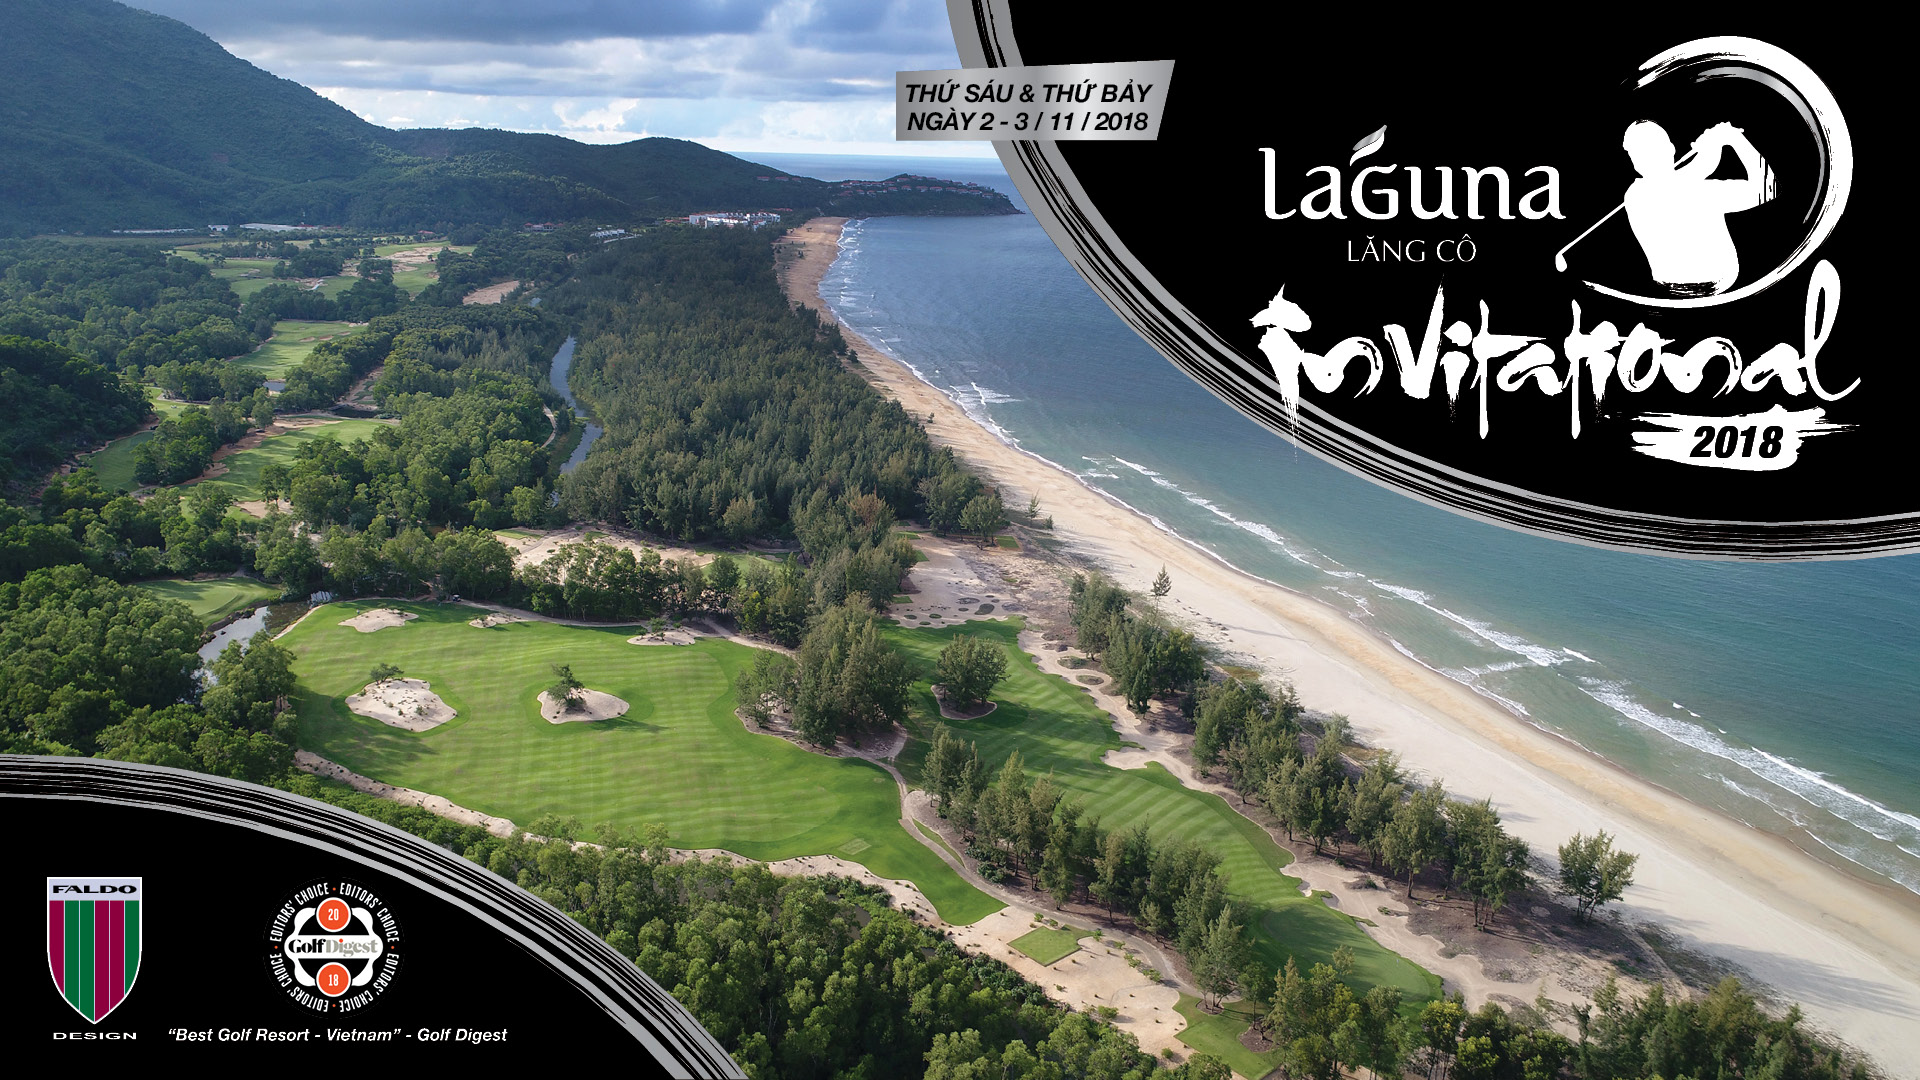 Giải đấu Laguna Invitational 2018